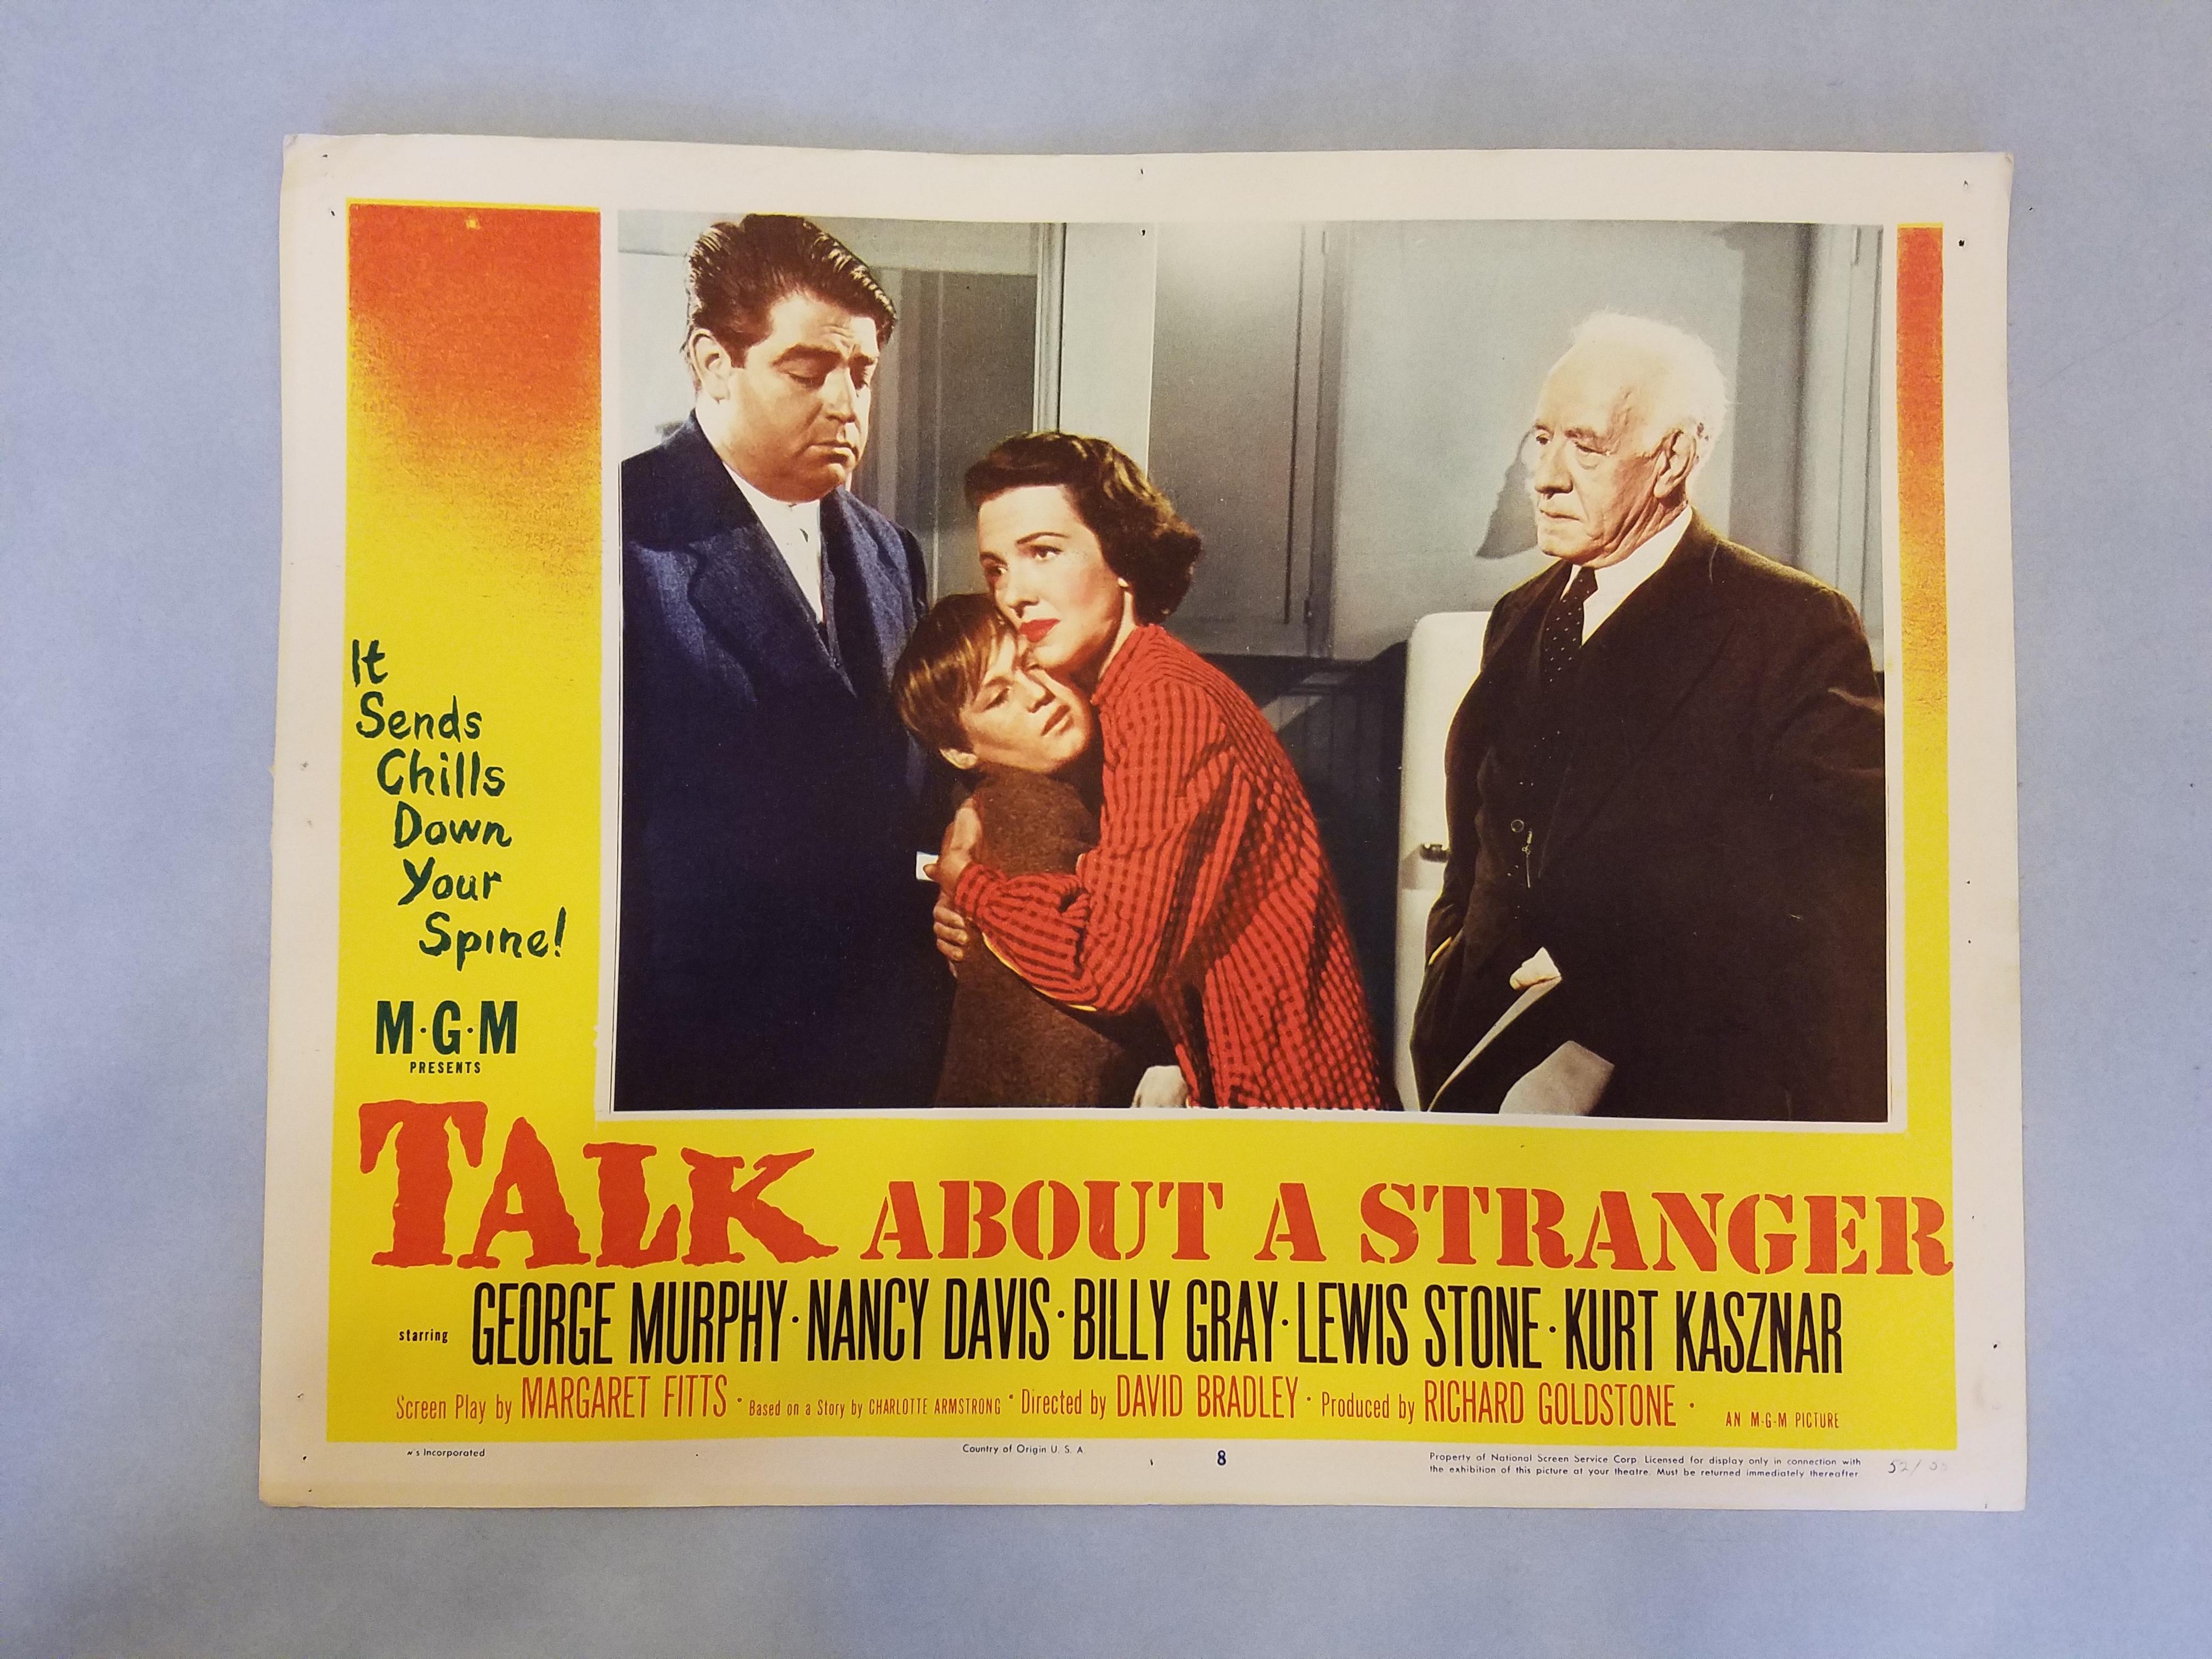 talk-about-a-stranger-poster